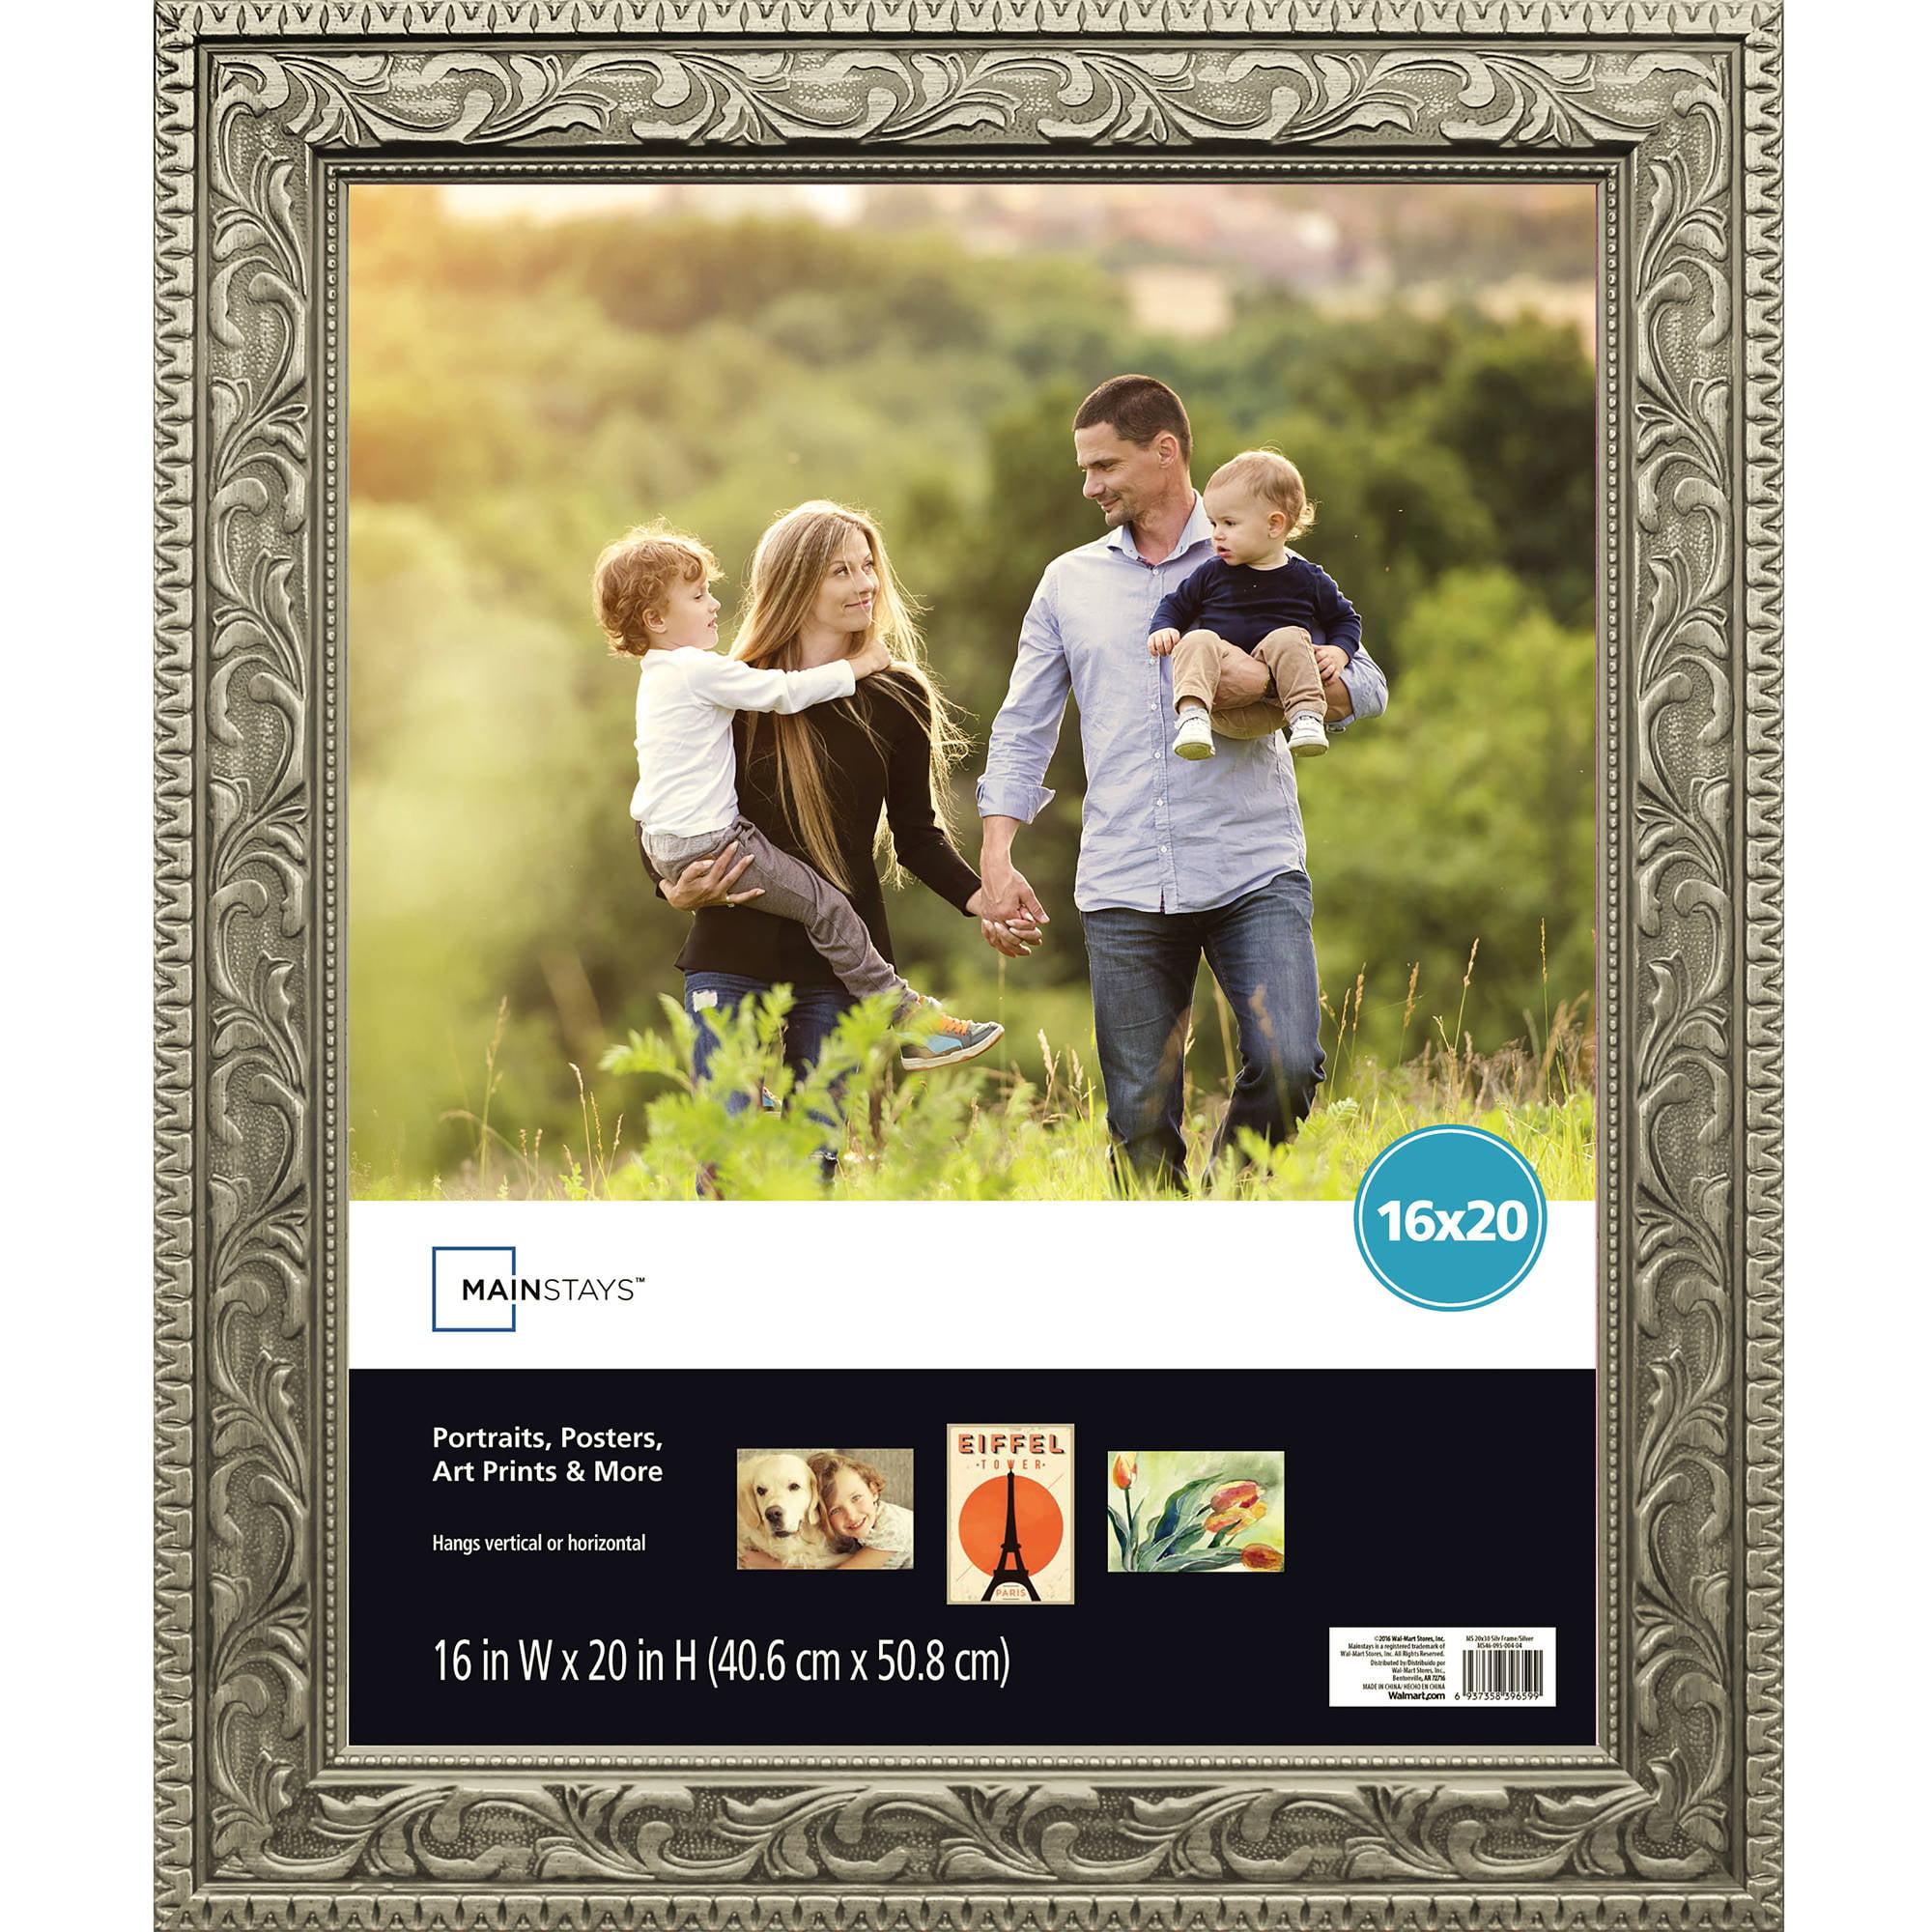 mainstays 16x20 gold poster frame walmart com